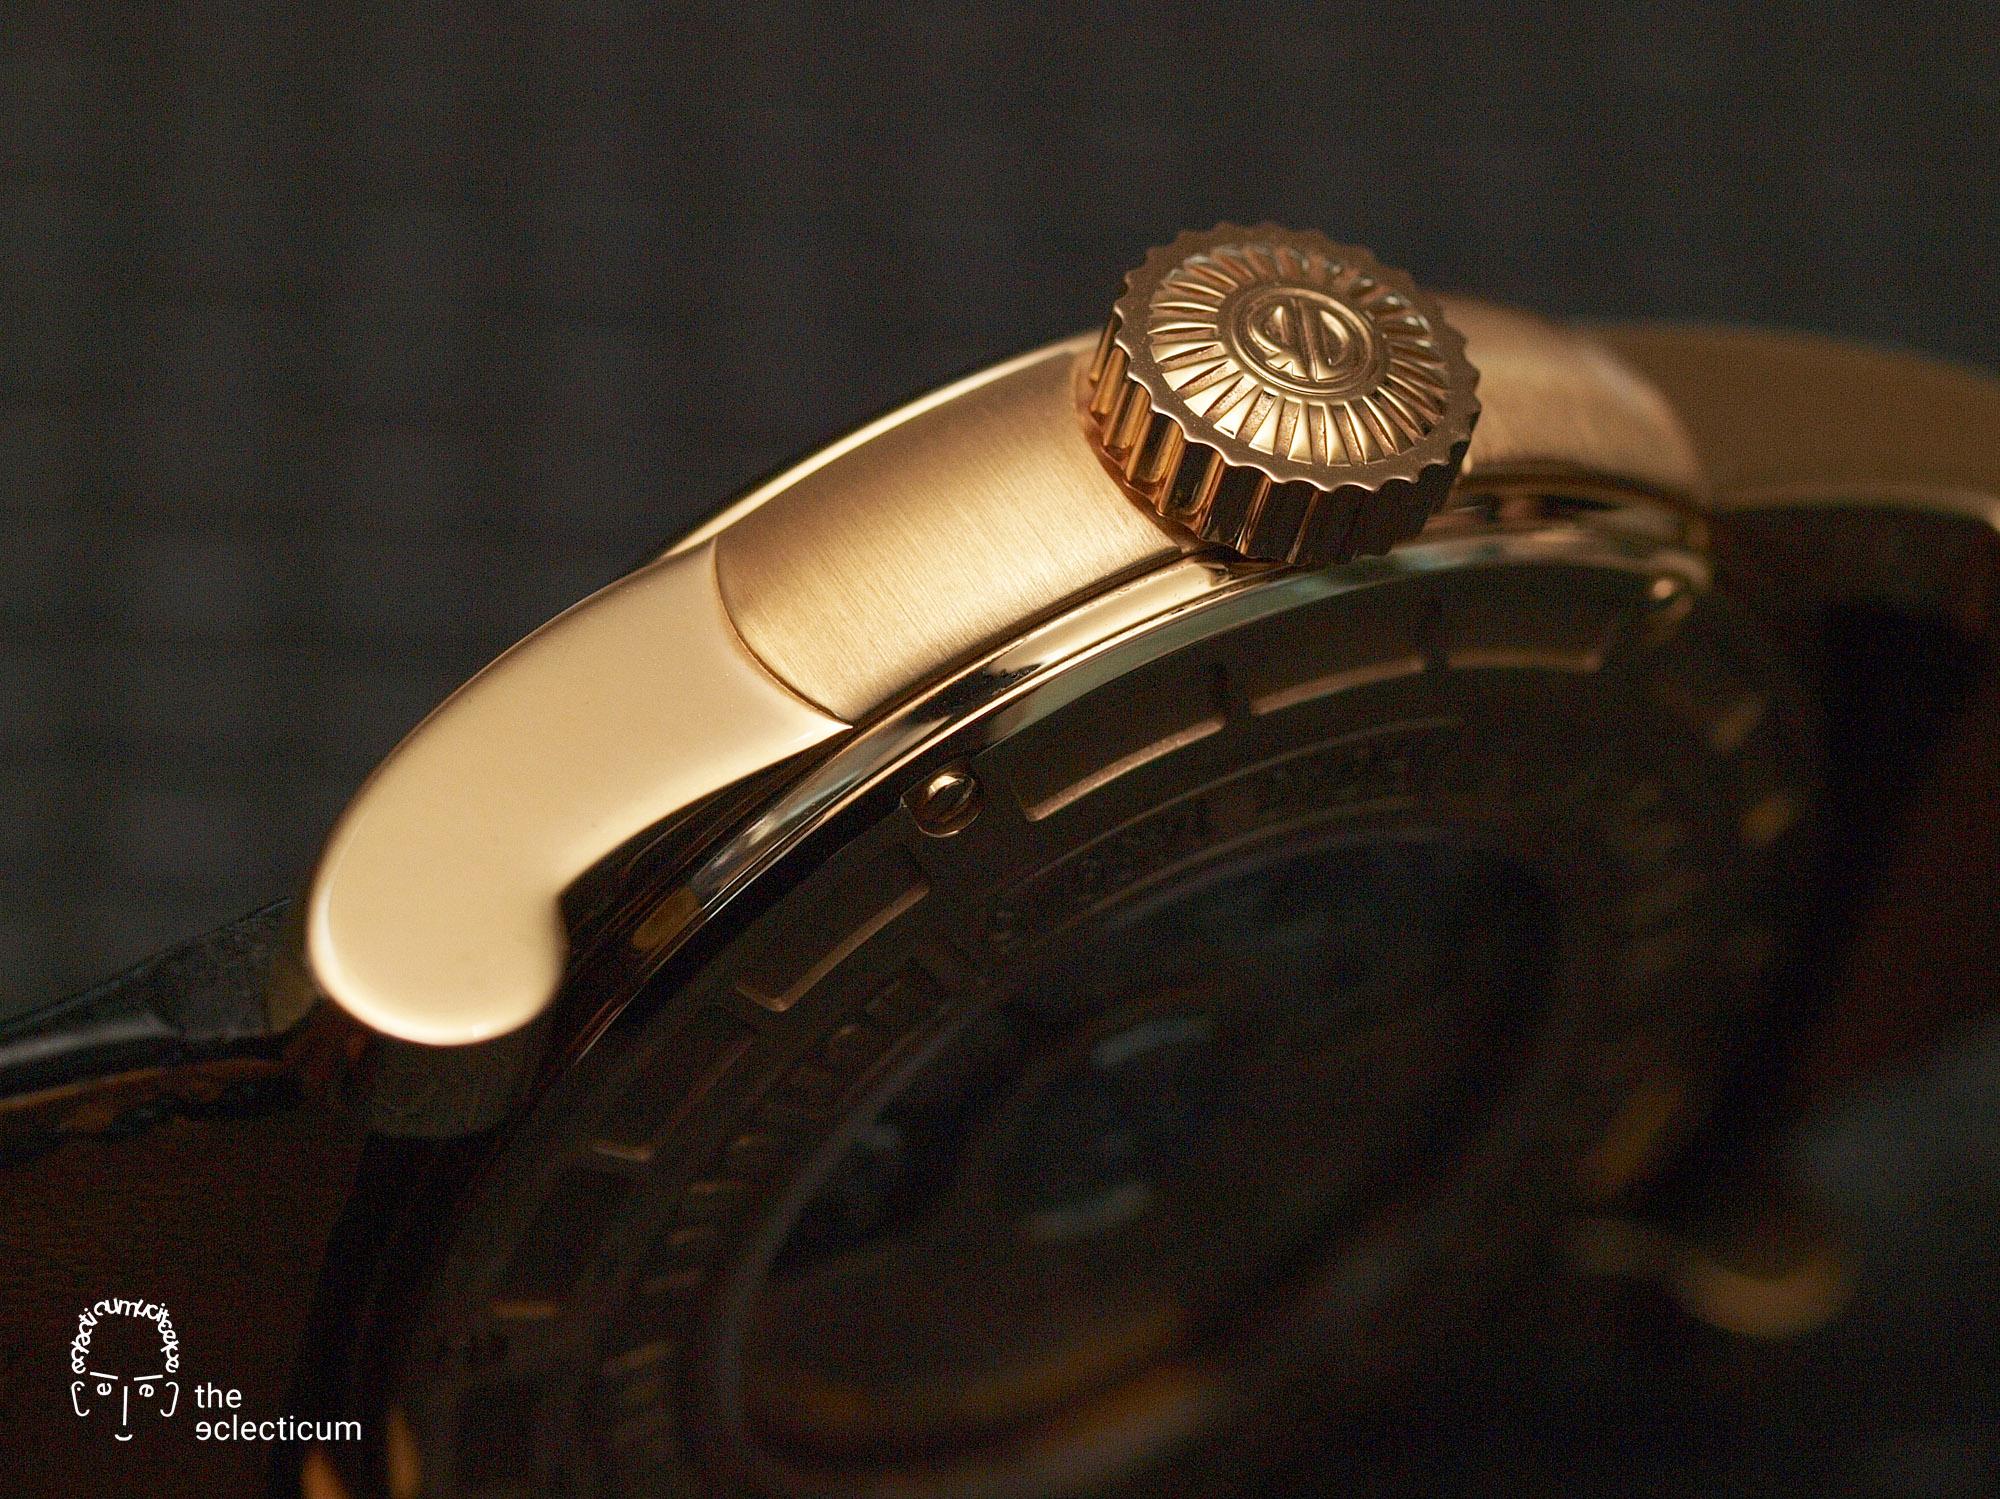 Roger Dubuis Hommage Perpetual Calendar Poinçon de Geneve Geneva Seal